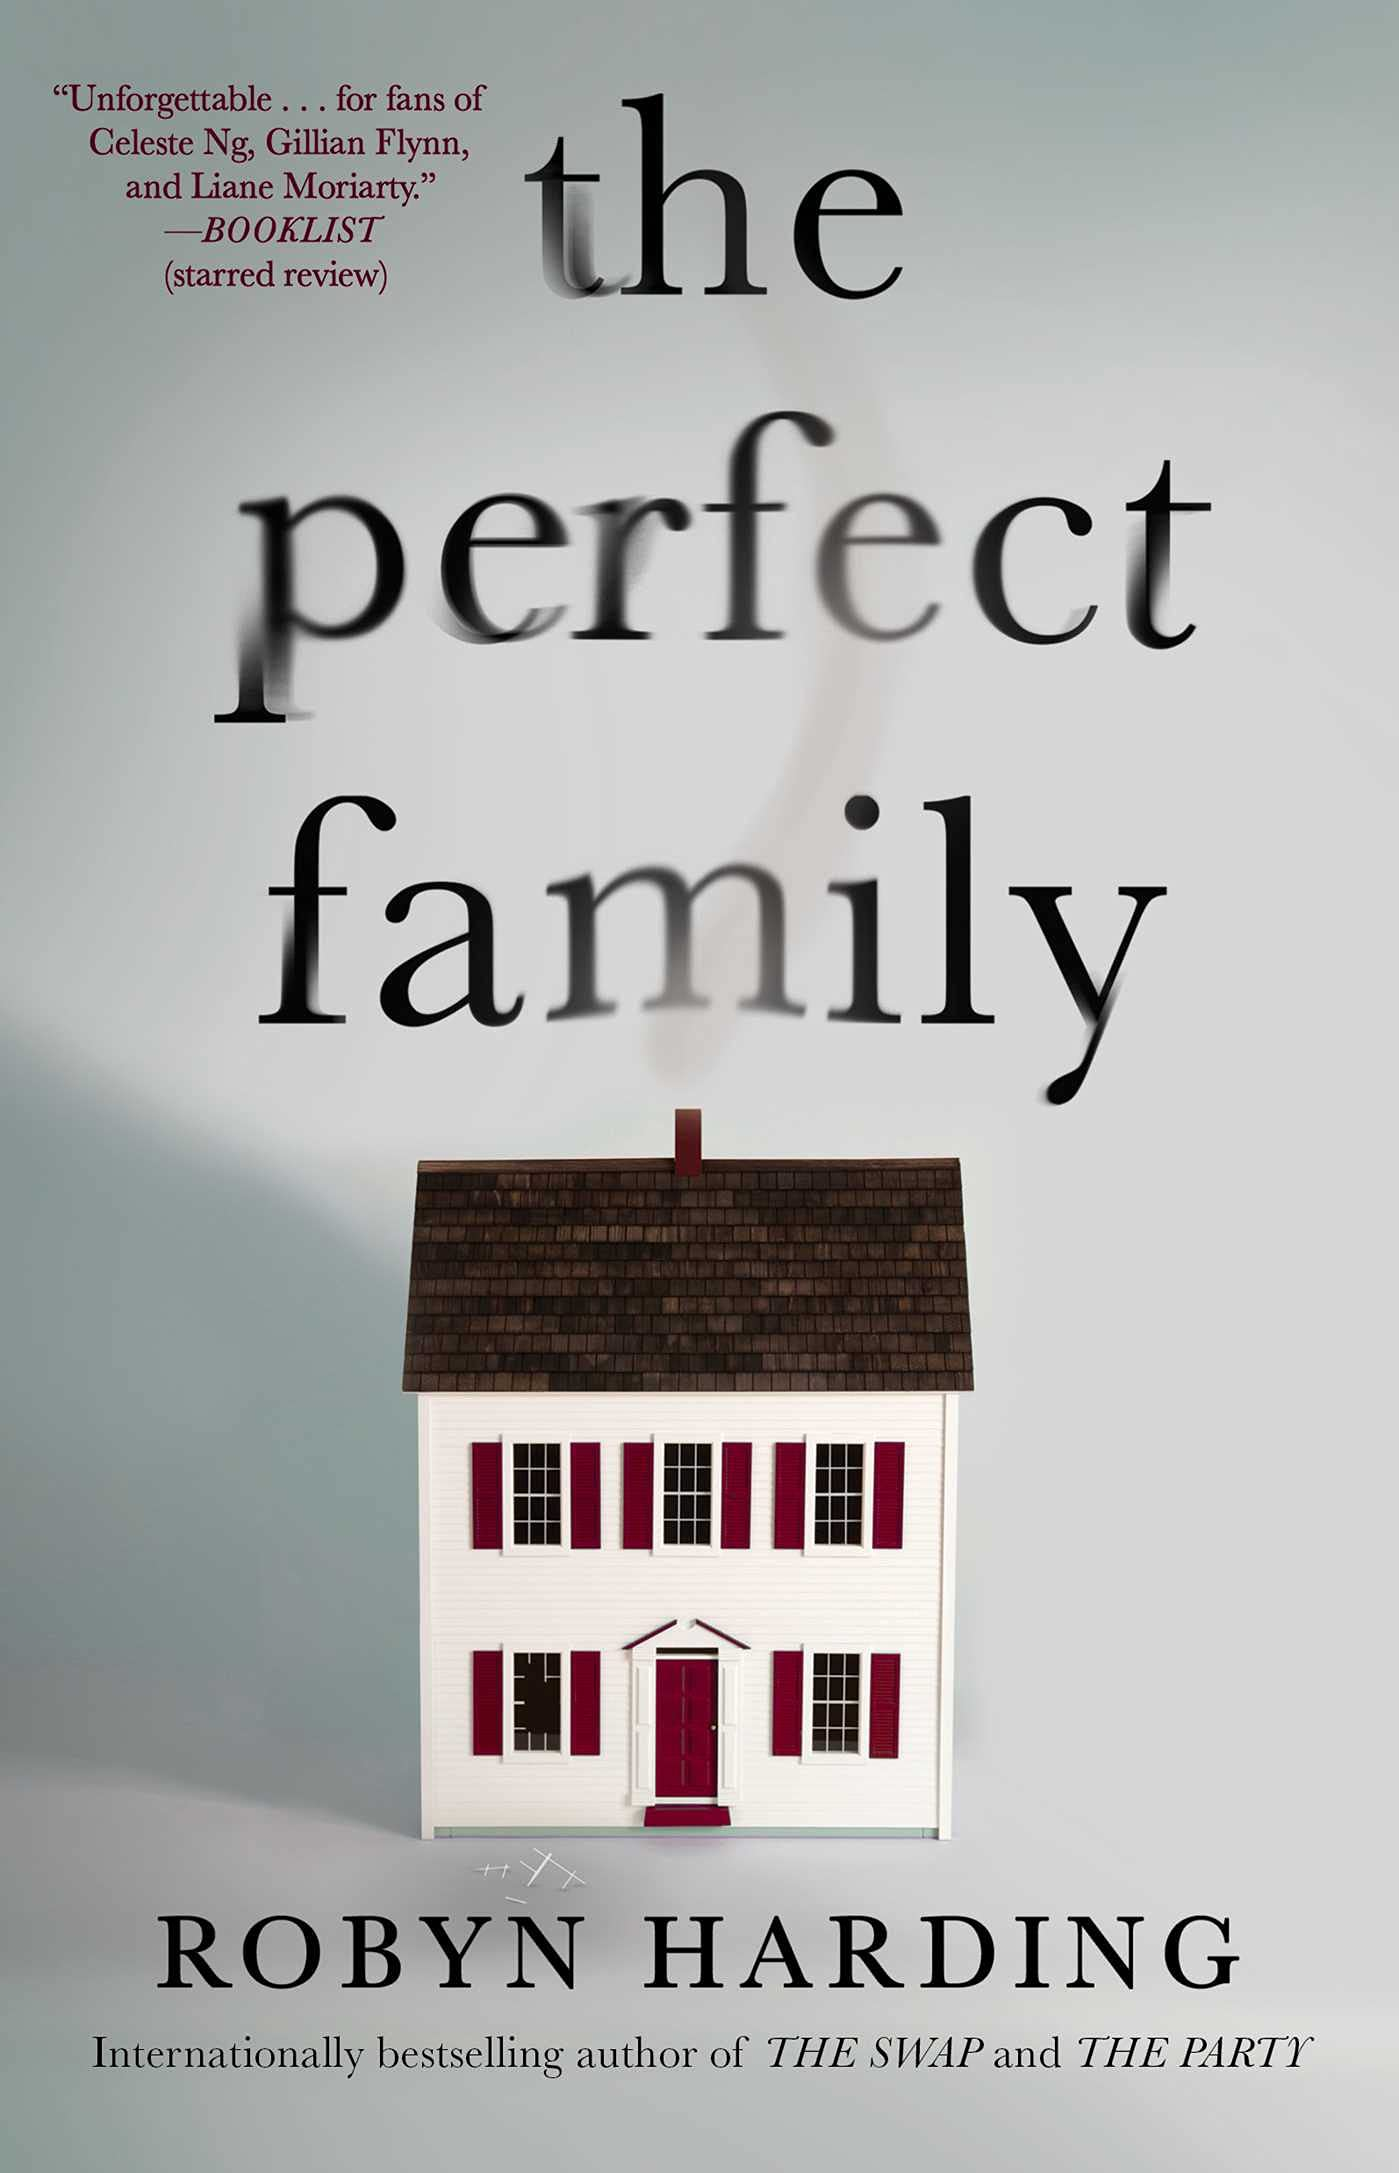 The Perfect Family: Harding, Robyn: 9781982169398: Amazon.com: Books